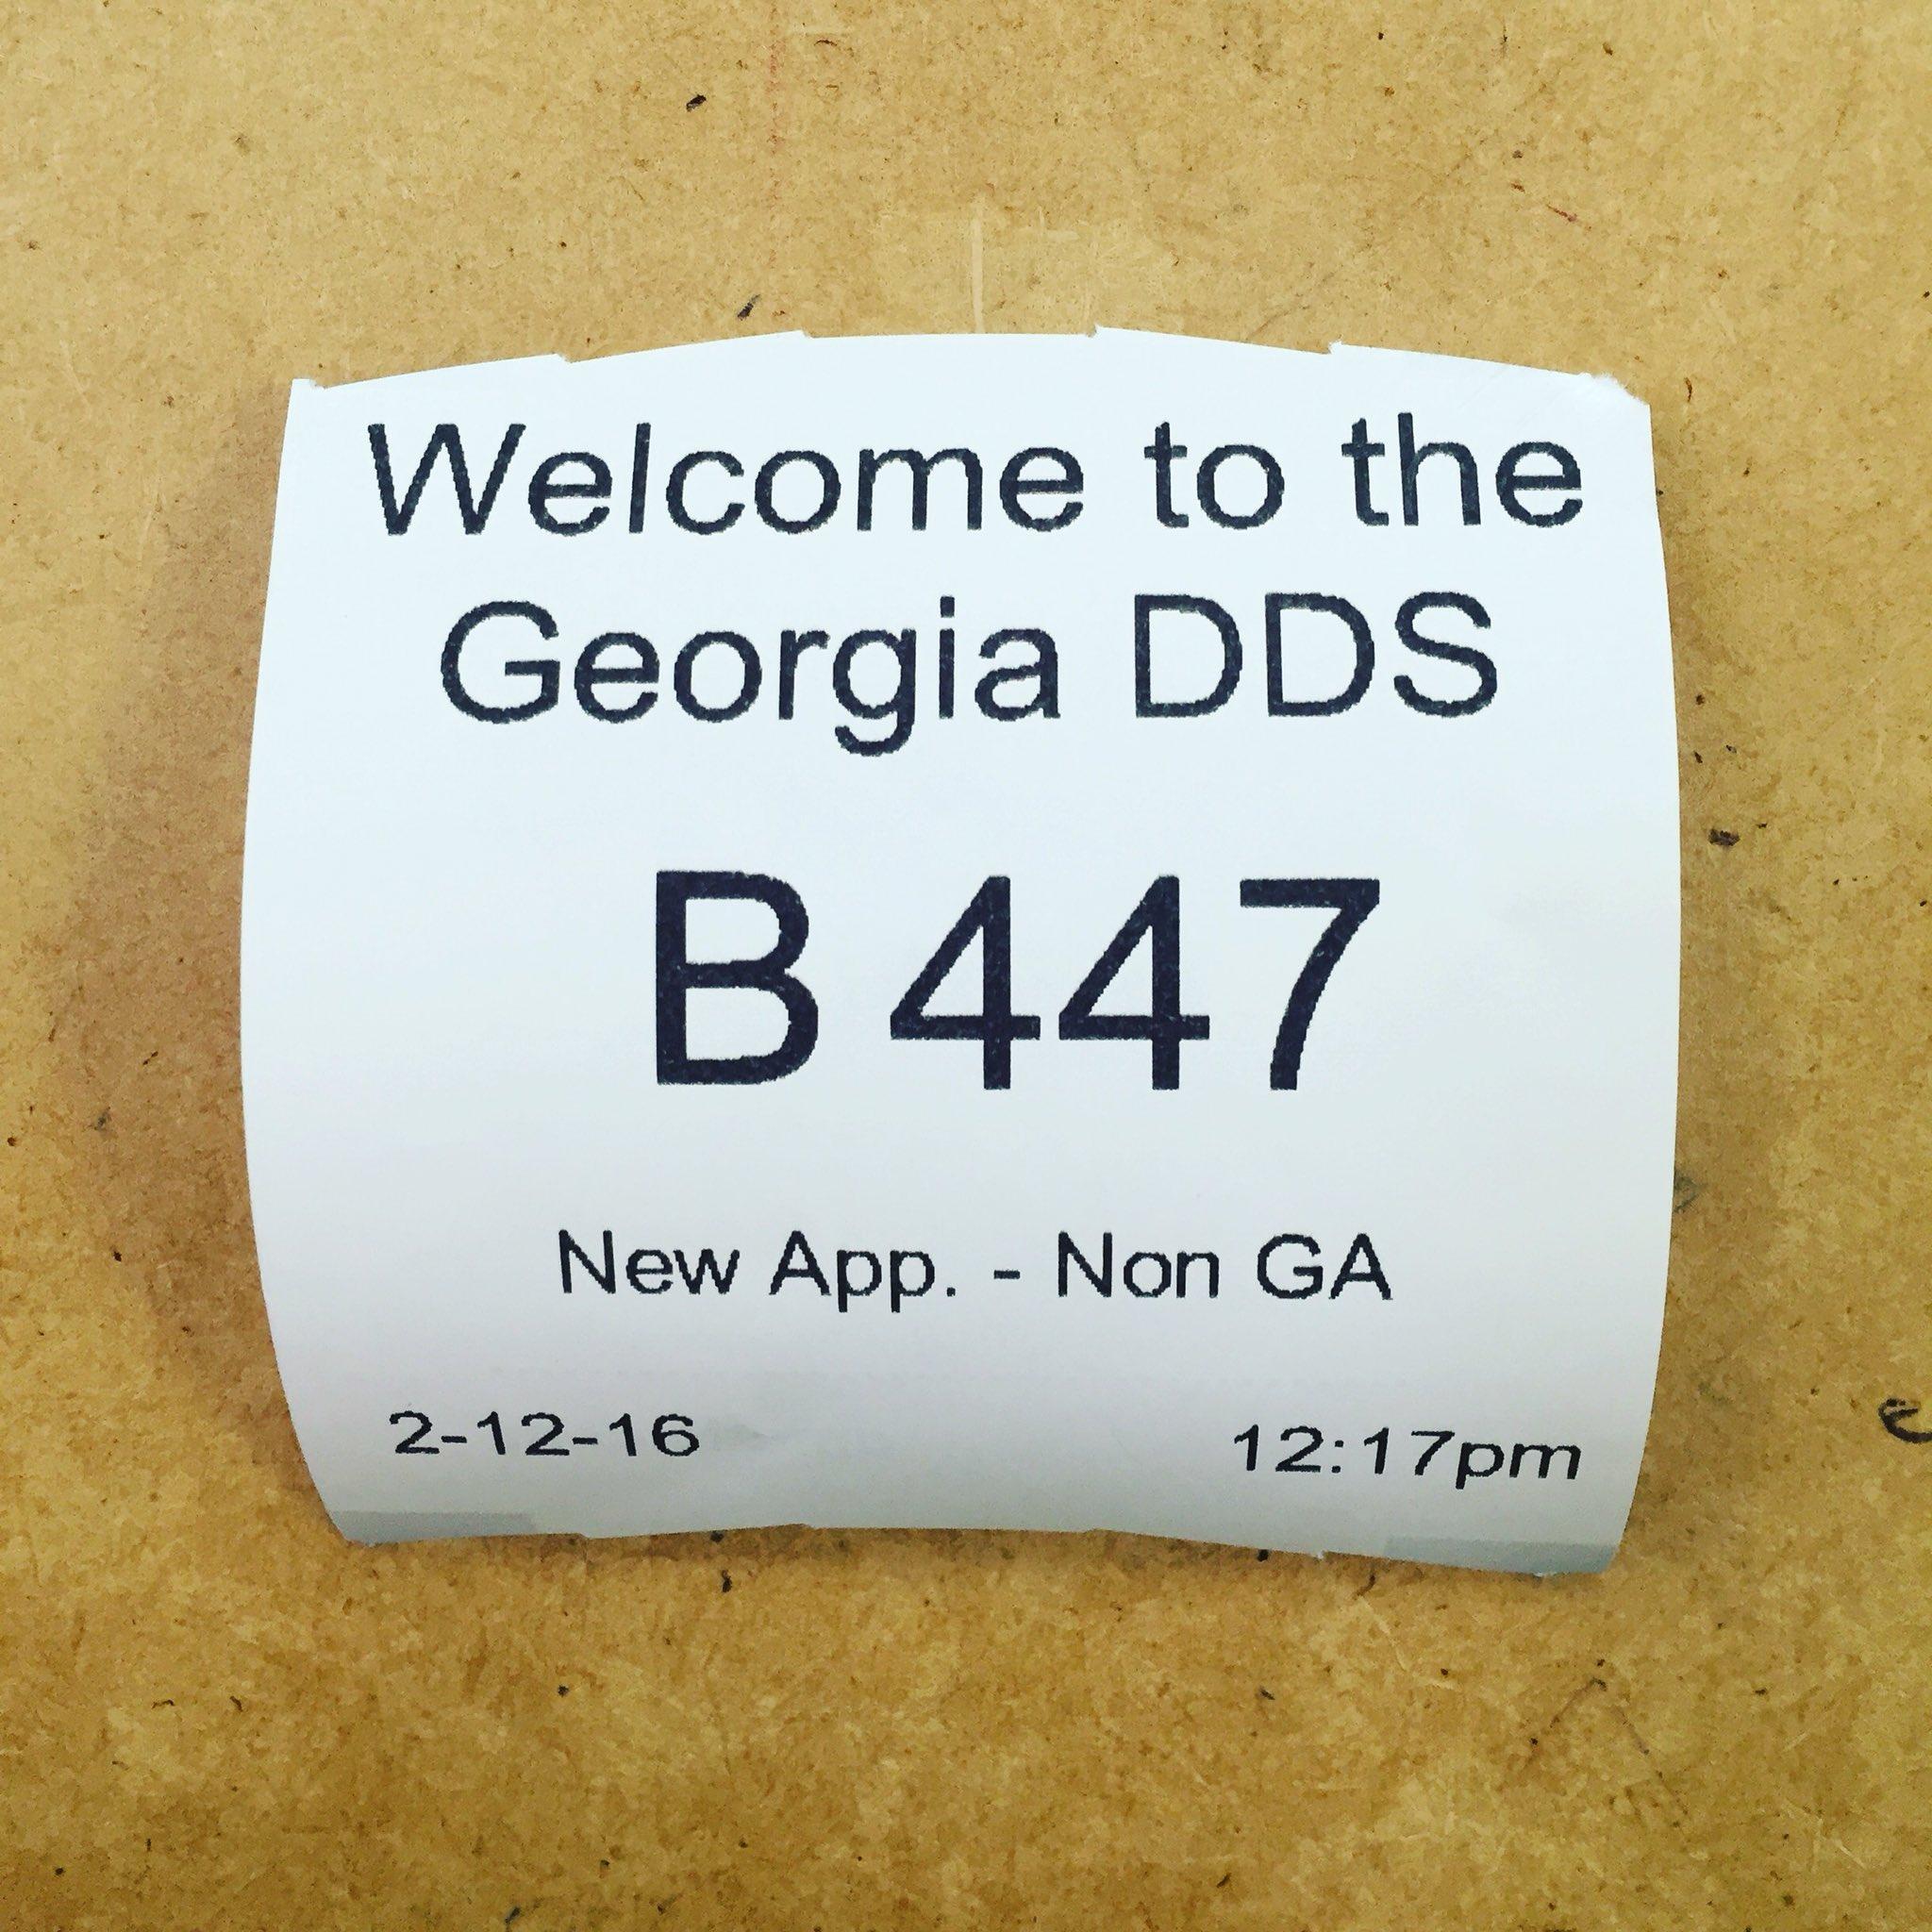 Oh dear.... Here we go... #dds #driverslicense #saywhat #ga #atlanta https://t.co/6zdUlQn23X